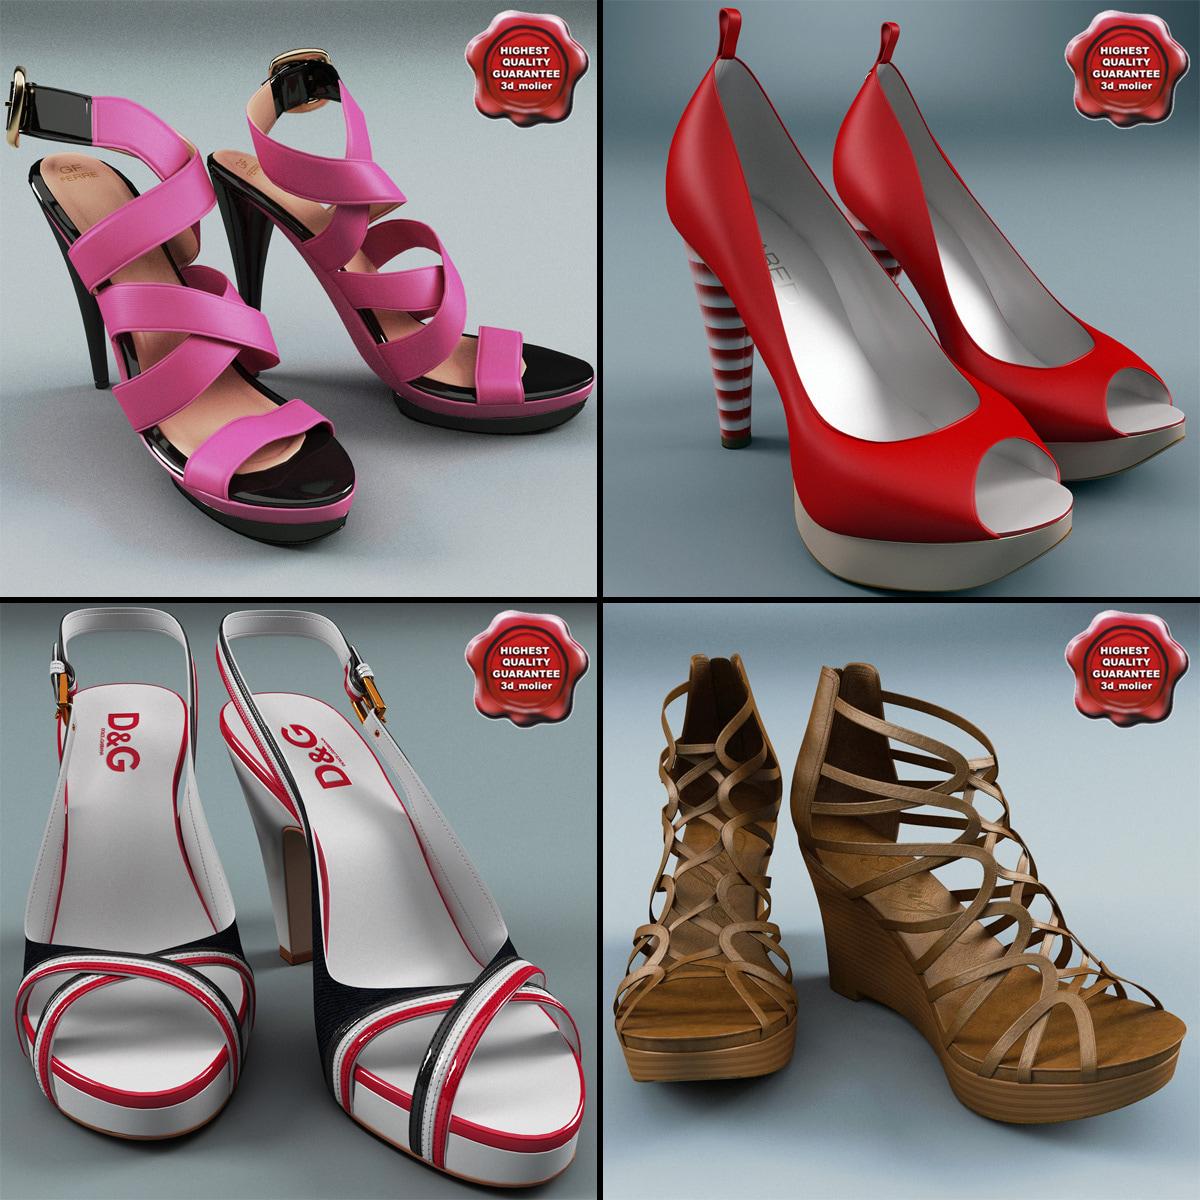 Women_Shoe_Collection_V3_00.jpg